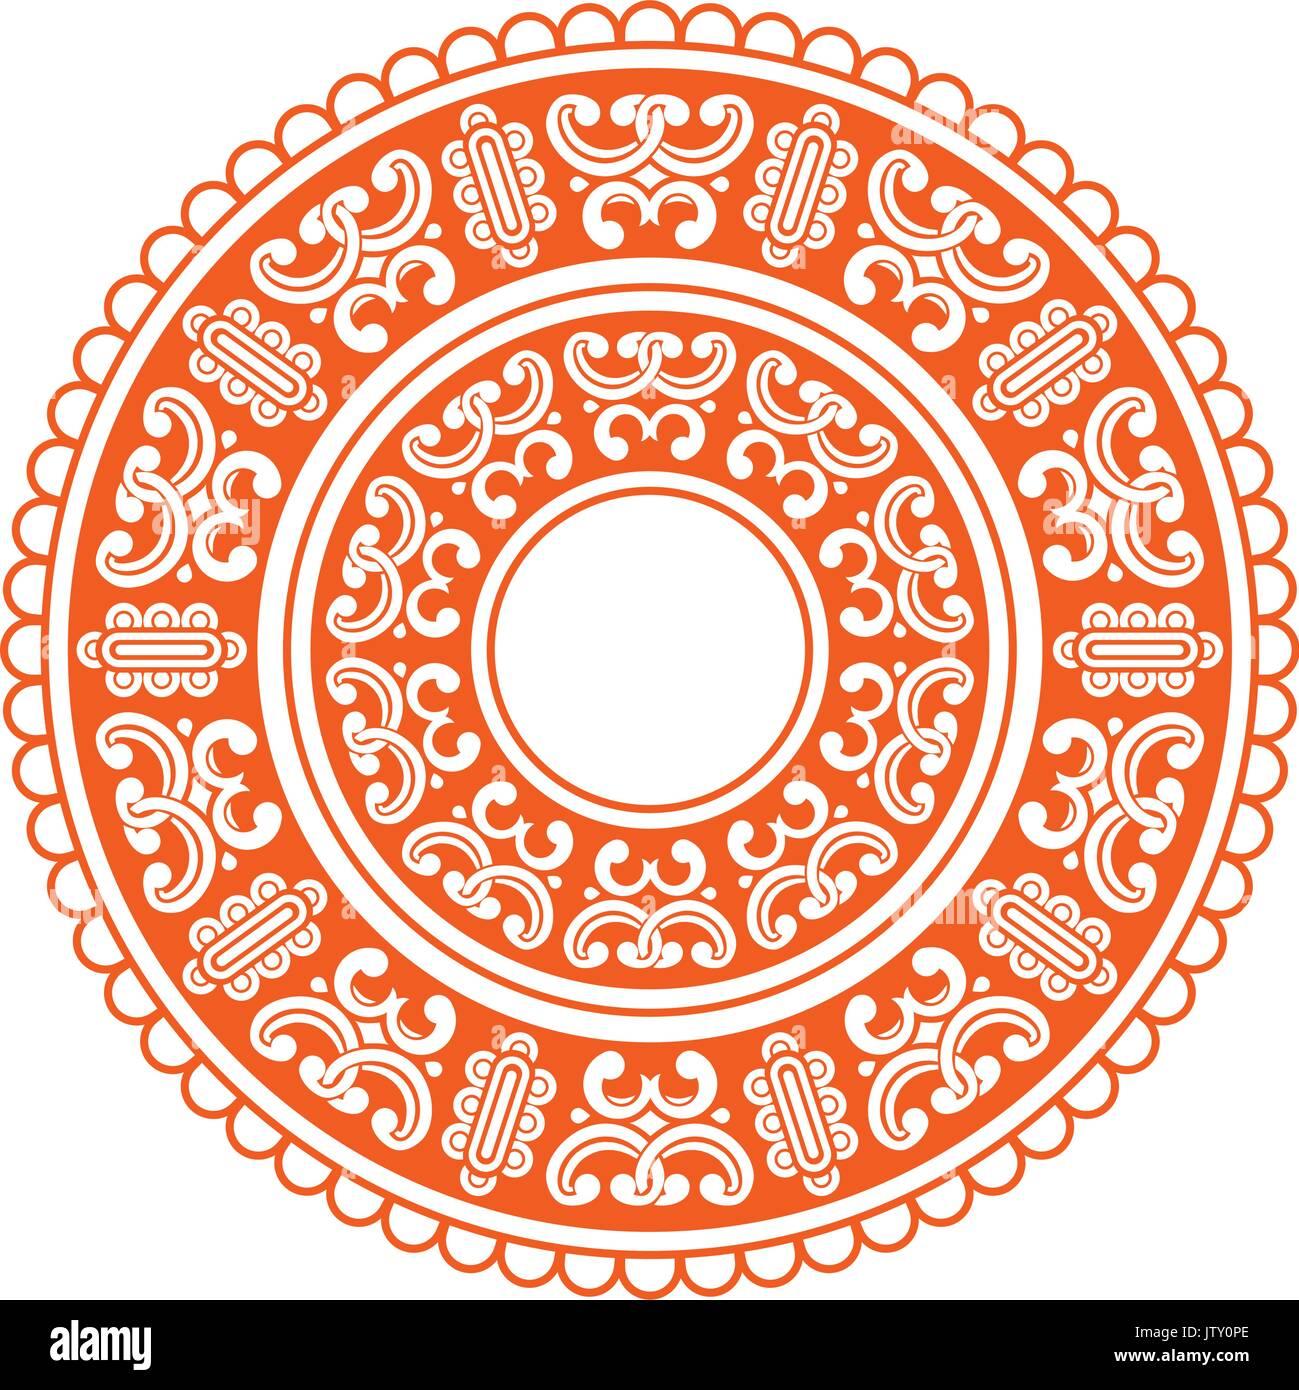 Mandala. Mongolian National ornament element for designers. Stock Vector